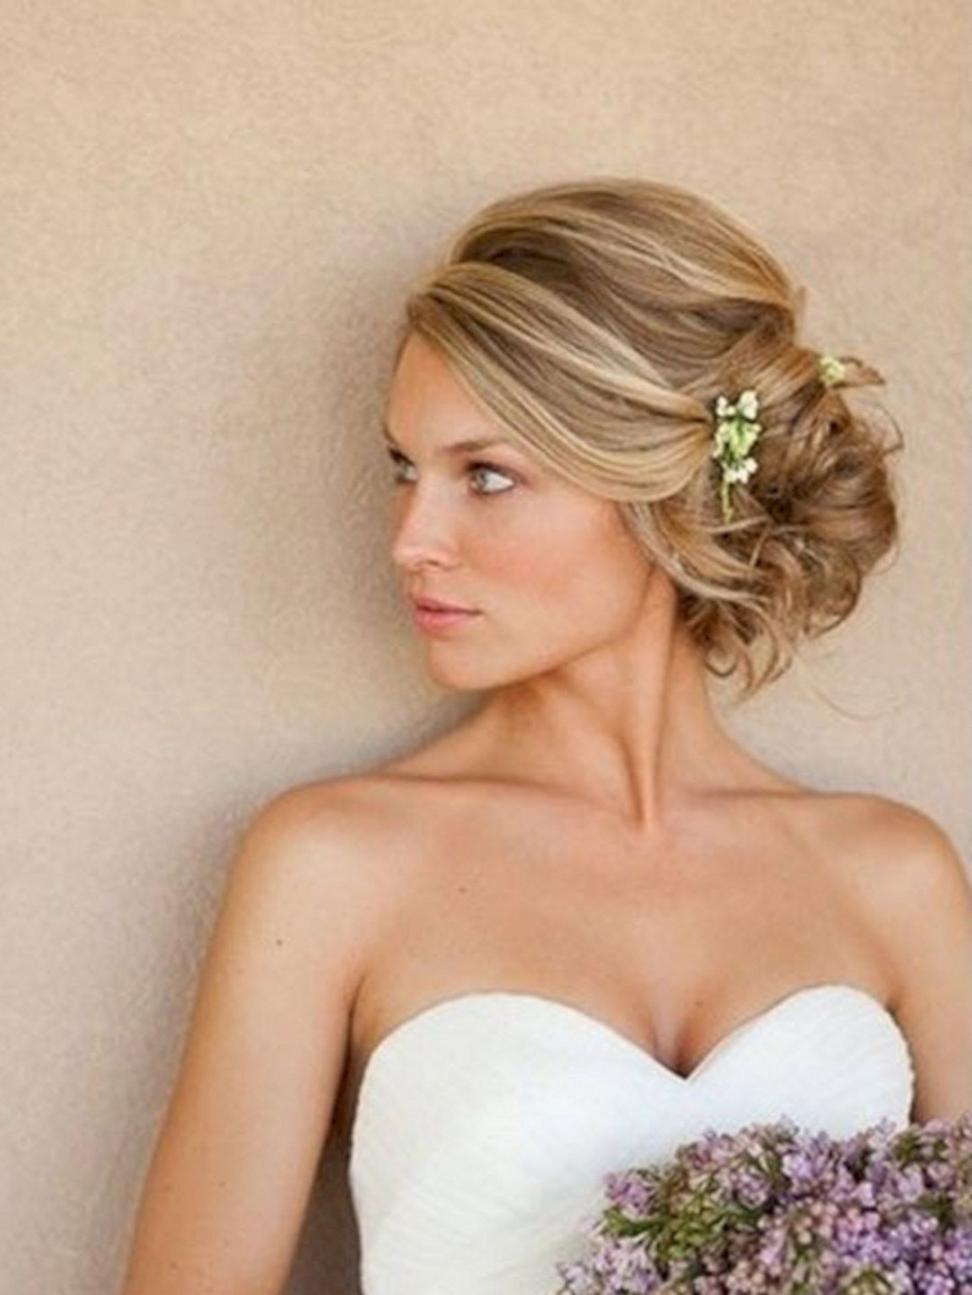 Wedding Hairstyle Short Hair – Oosile | Wedding Updos For Short Within Wedding Hairstyles For Short Hair Updos (View 13 of 15)